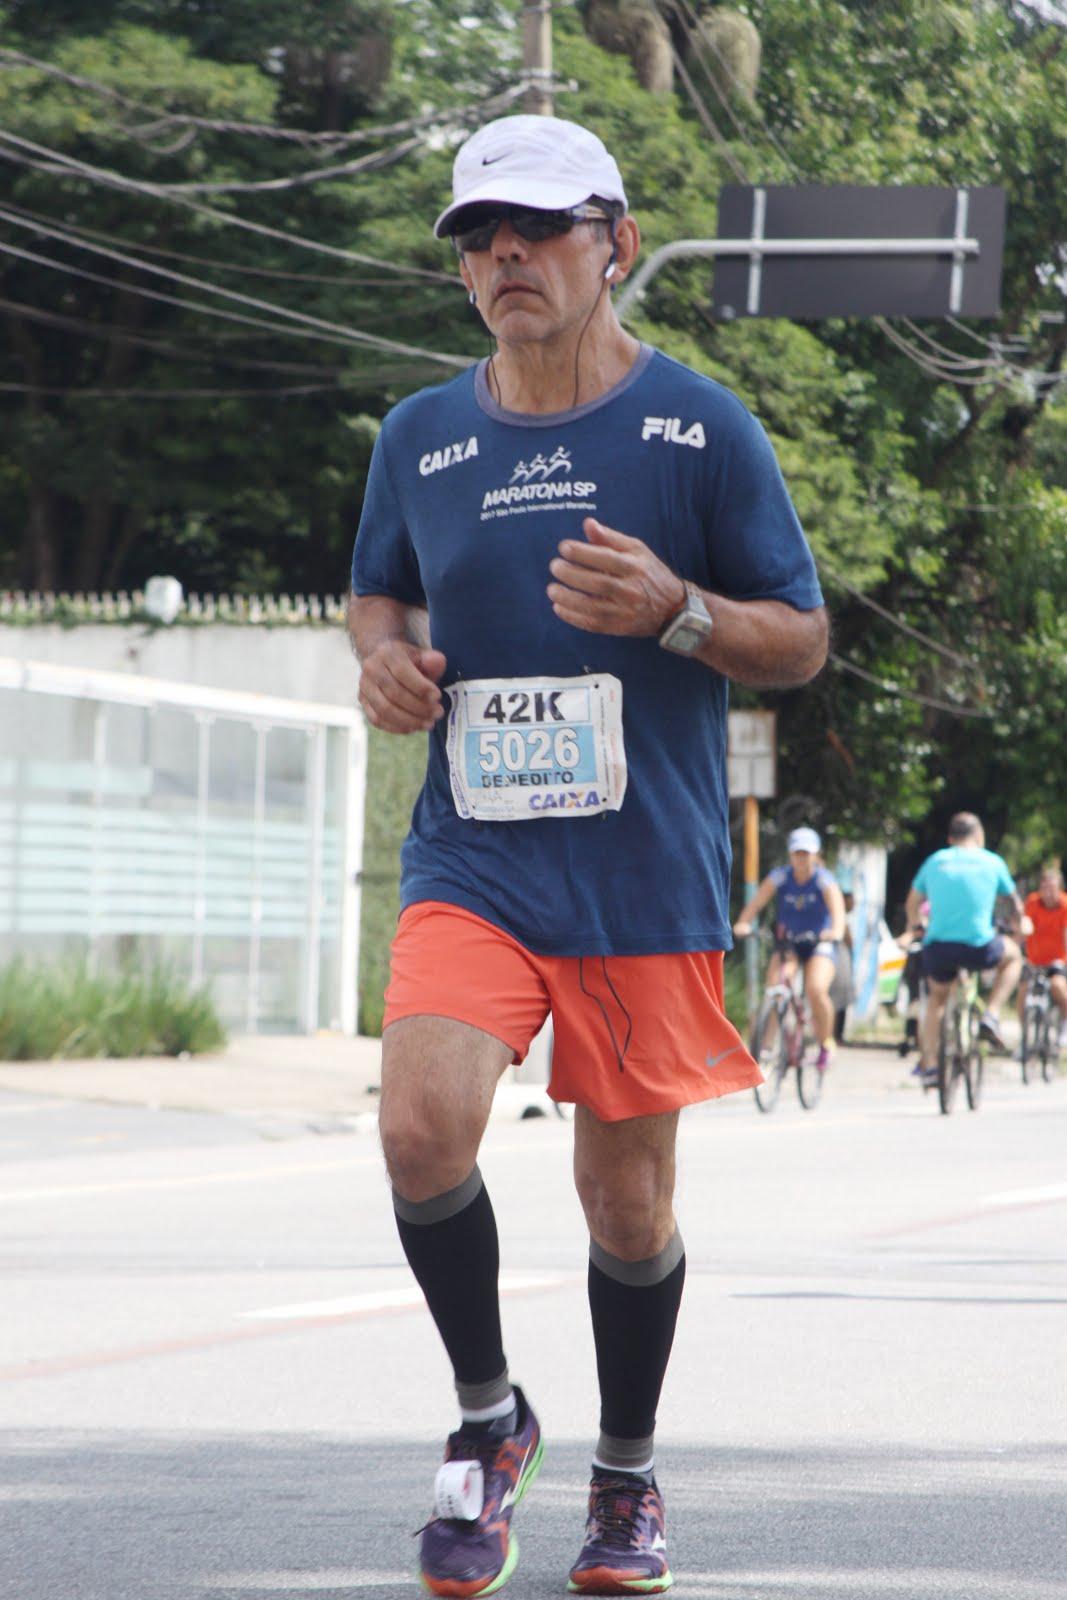 Maratona de São Paulo 2017